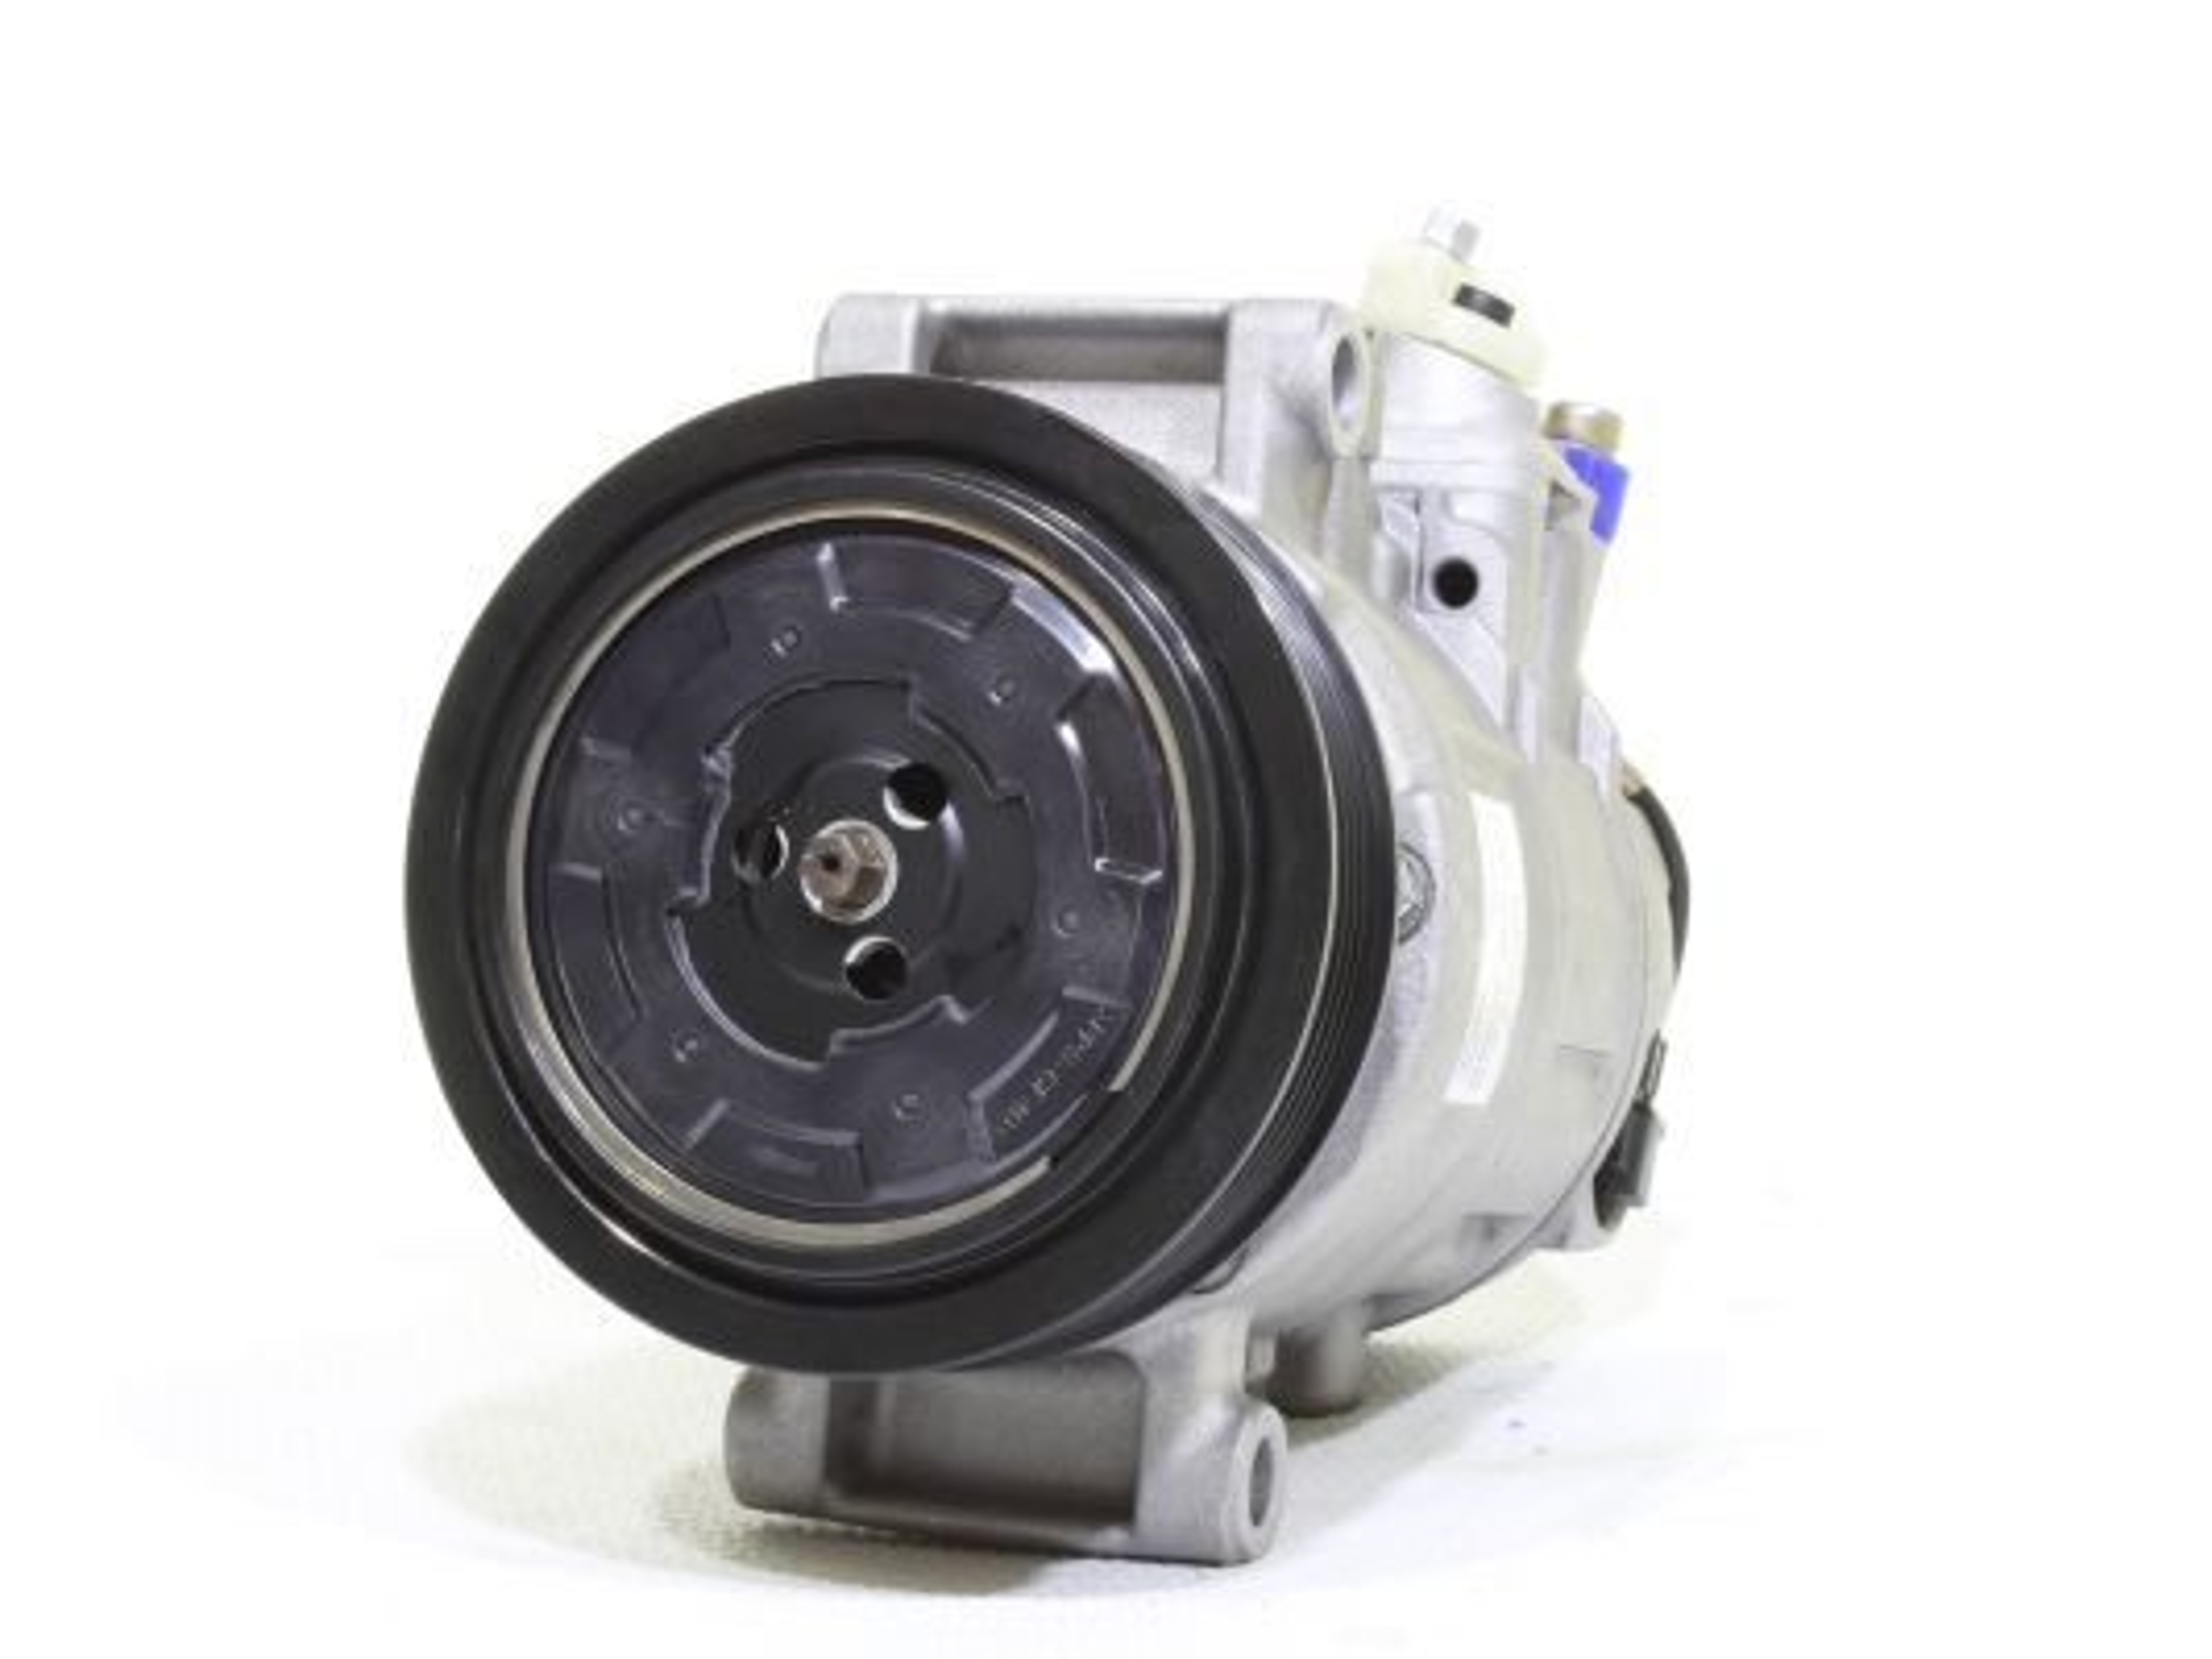 6SEU14C ALANKO PAG 46, Kältemittel: R 134a Riemenscheiben-Ø: 110mm Klimakompressor 10550777 günstig kaufen